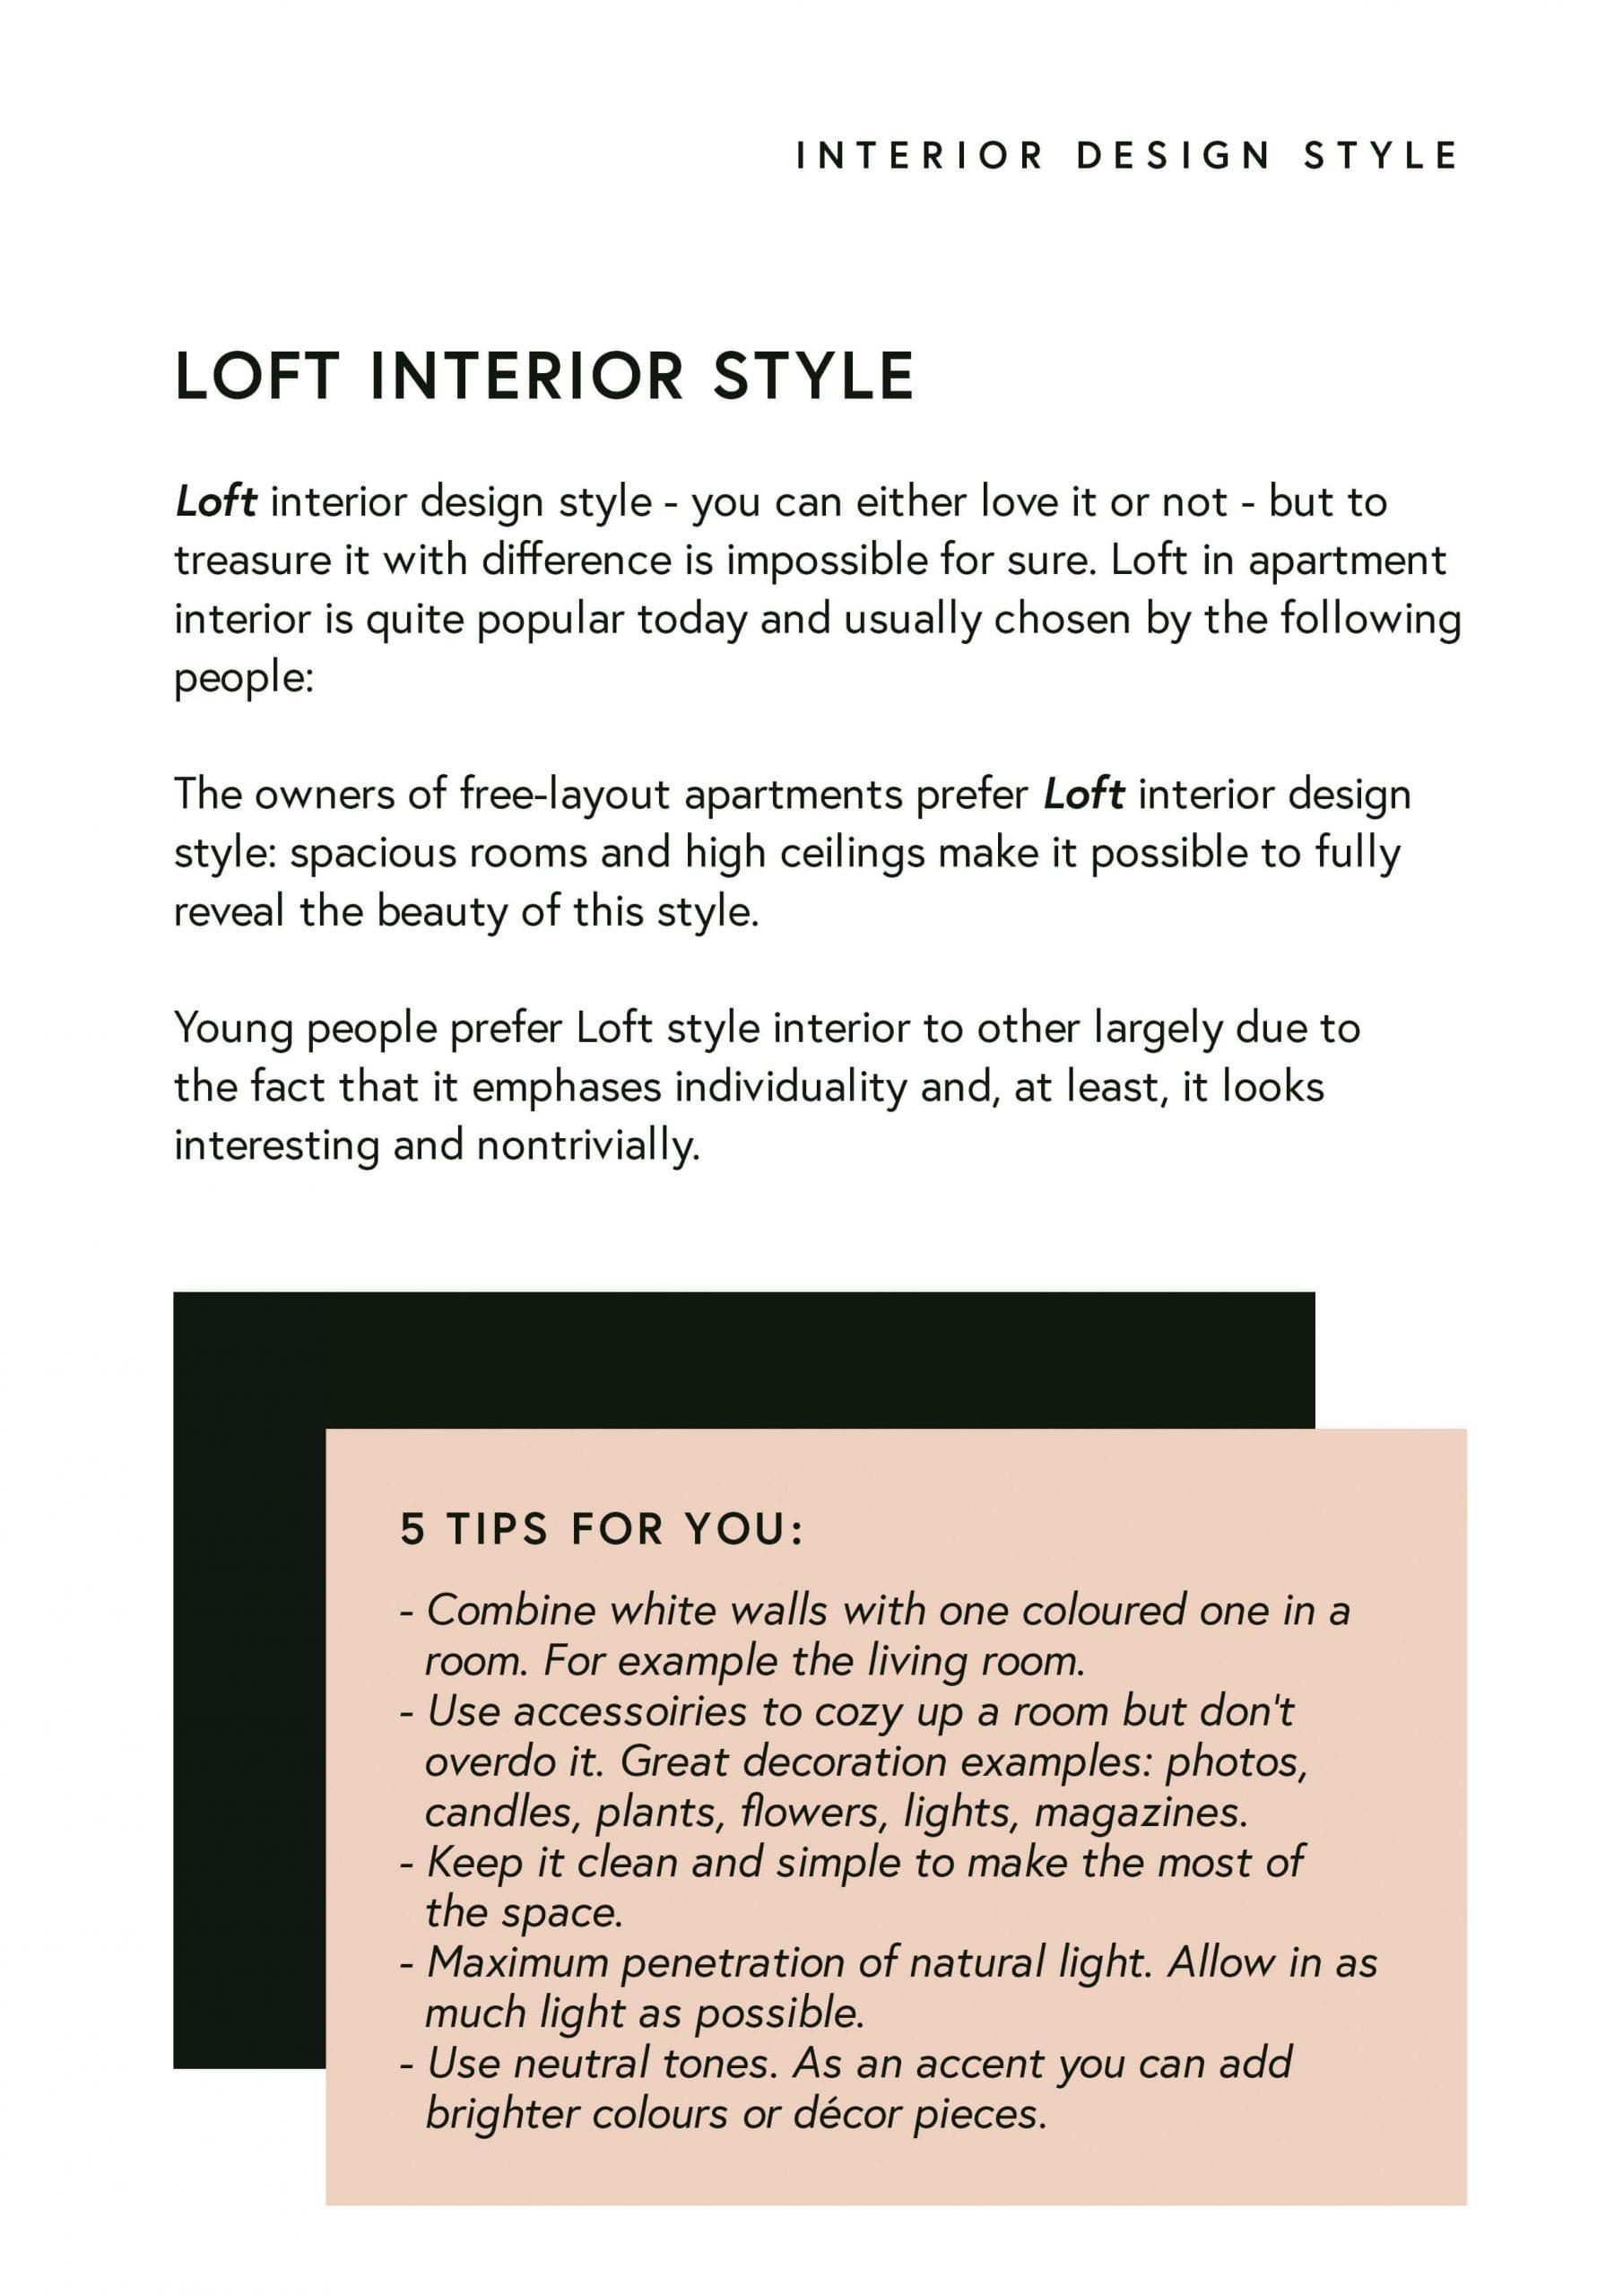 ann-rod-interior-styling-adviceinterior-style